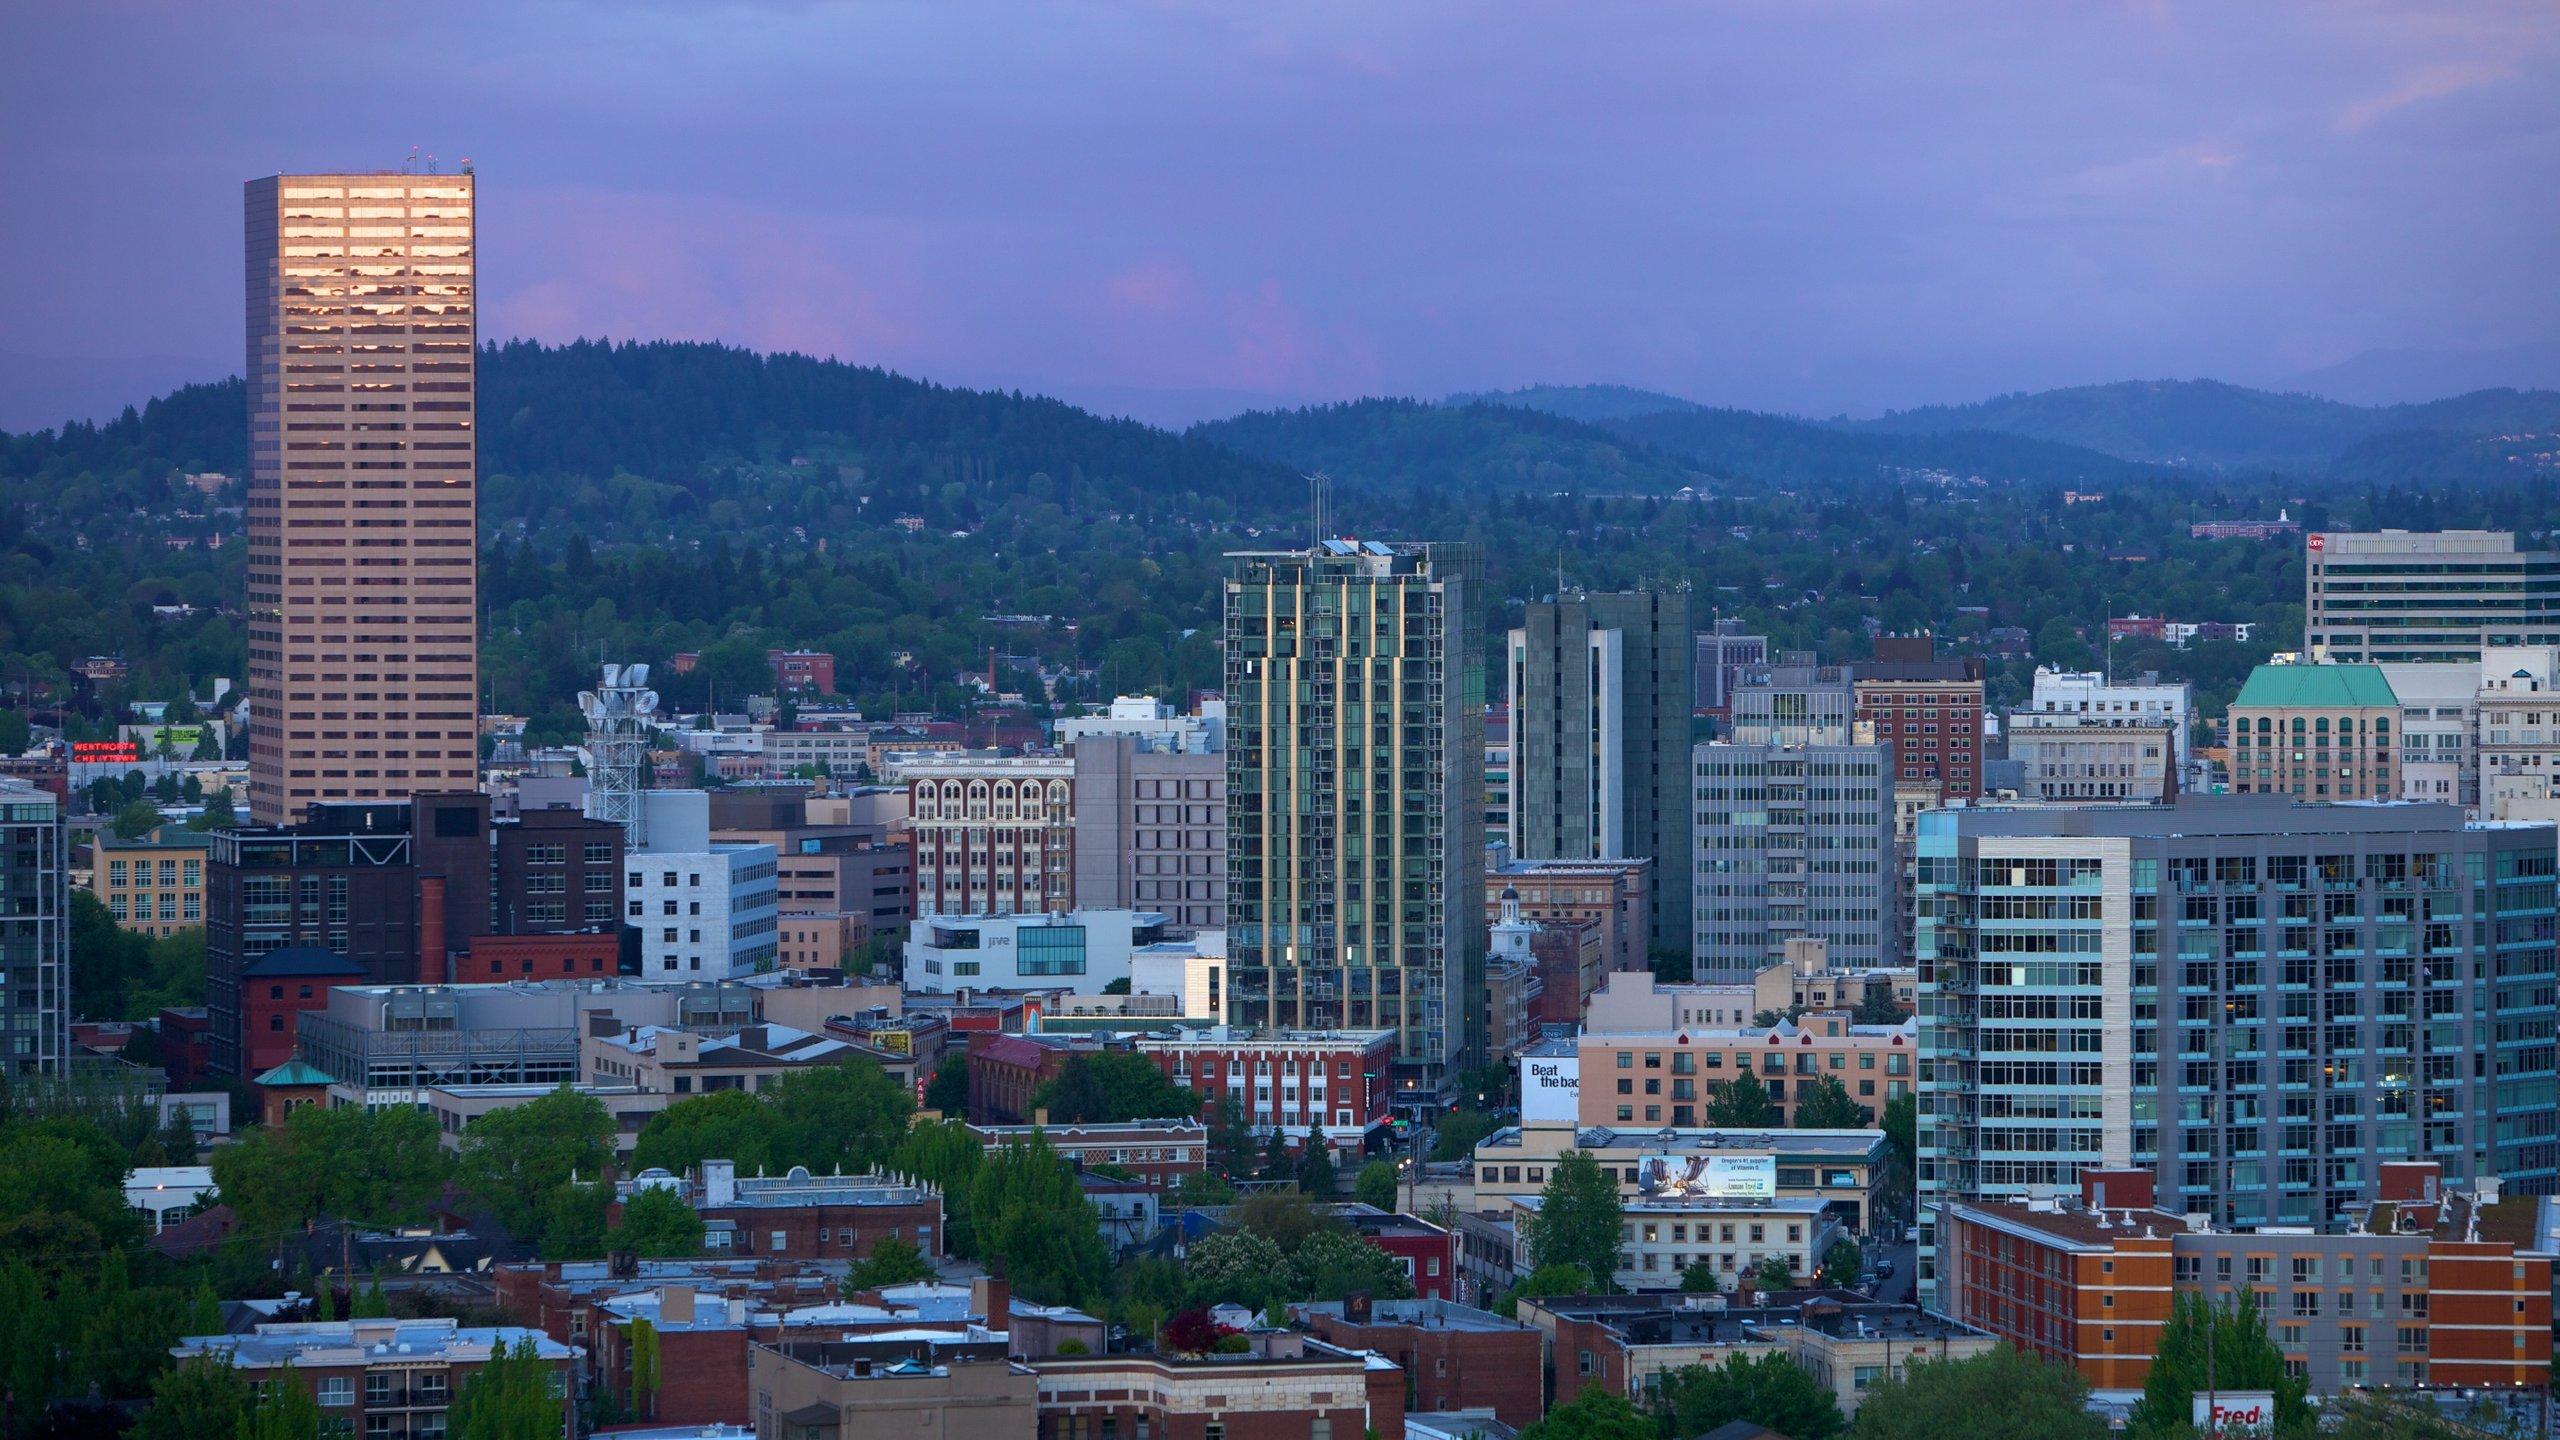 Multnomah County, Oregon, United States of America